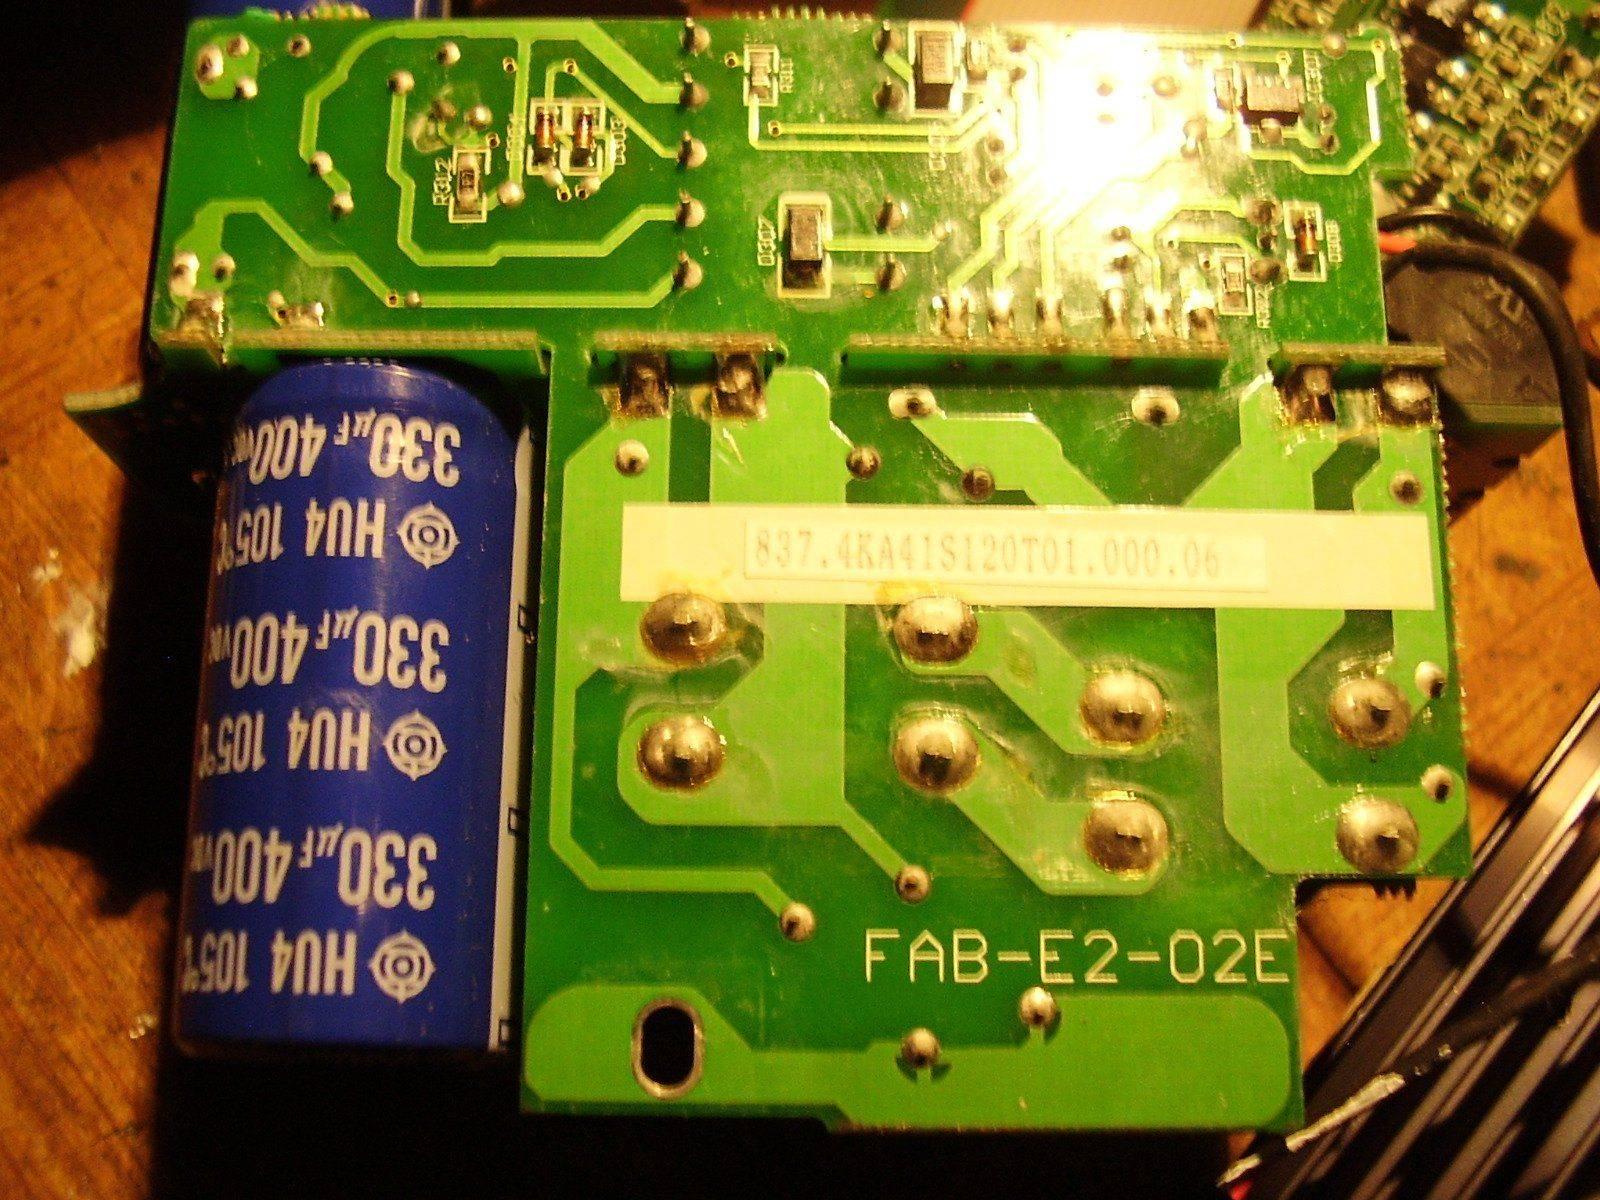 P1170005.JPG